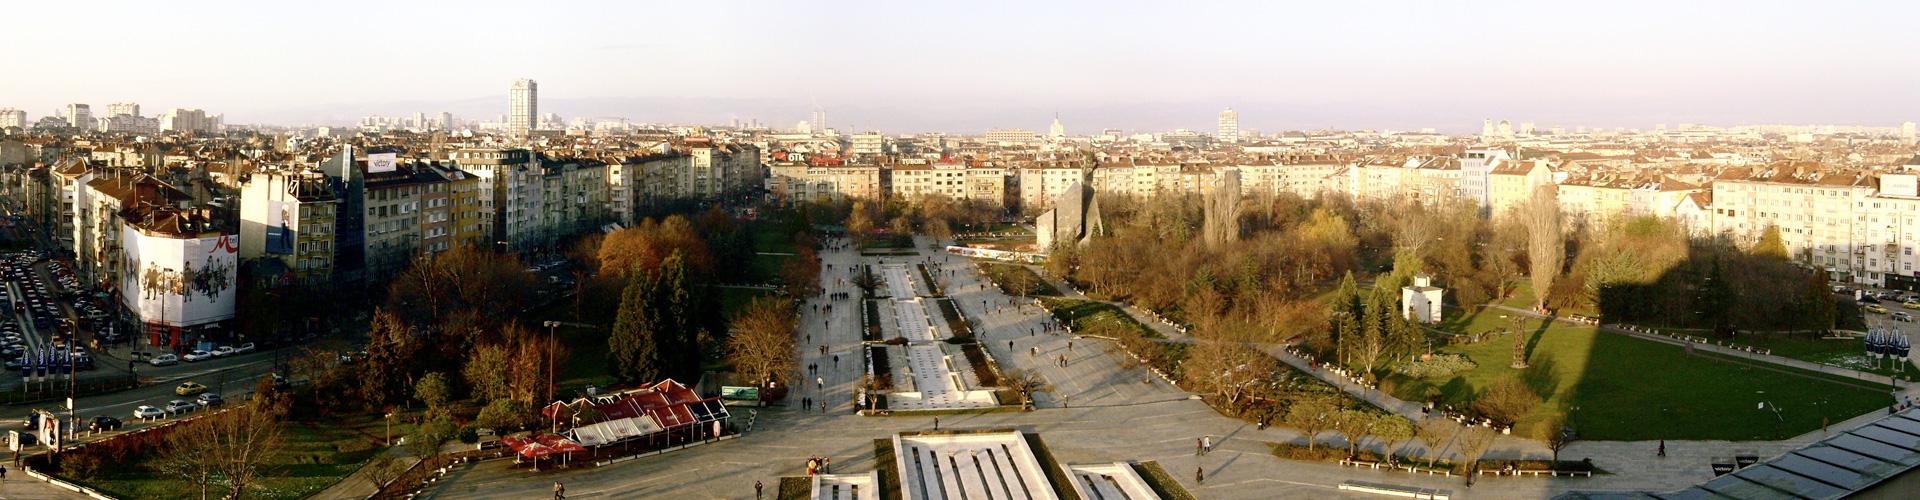 TransferTaxi-EUROPE | bulgaria-sofia_ndk-panorama - TransferTaxi-EUROPE